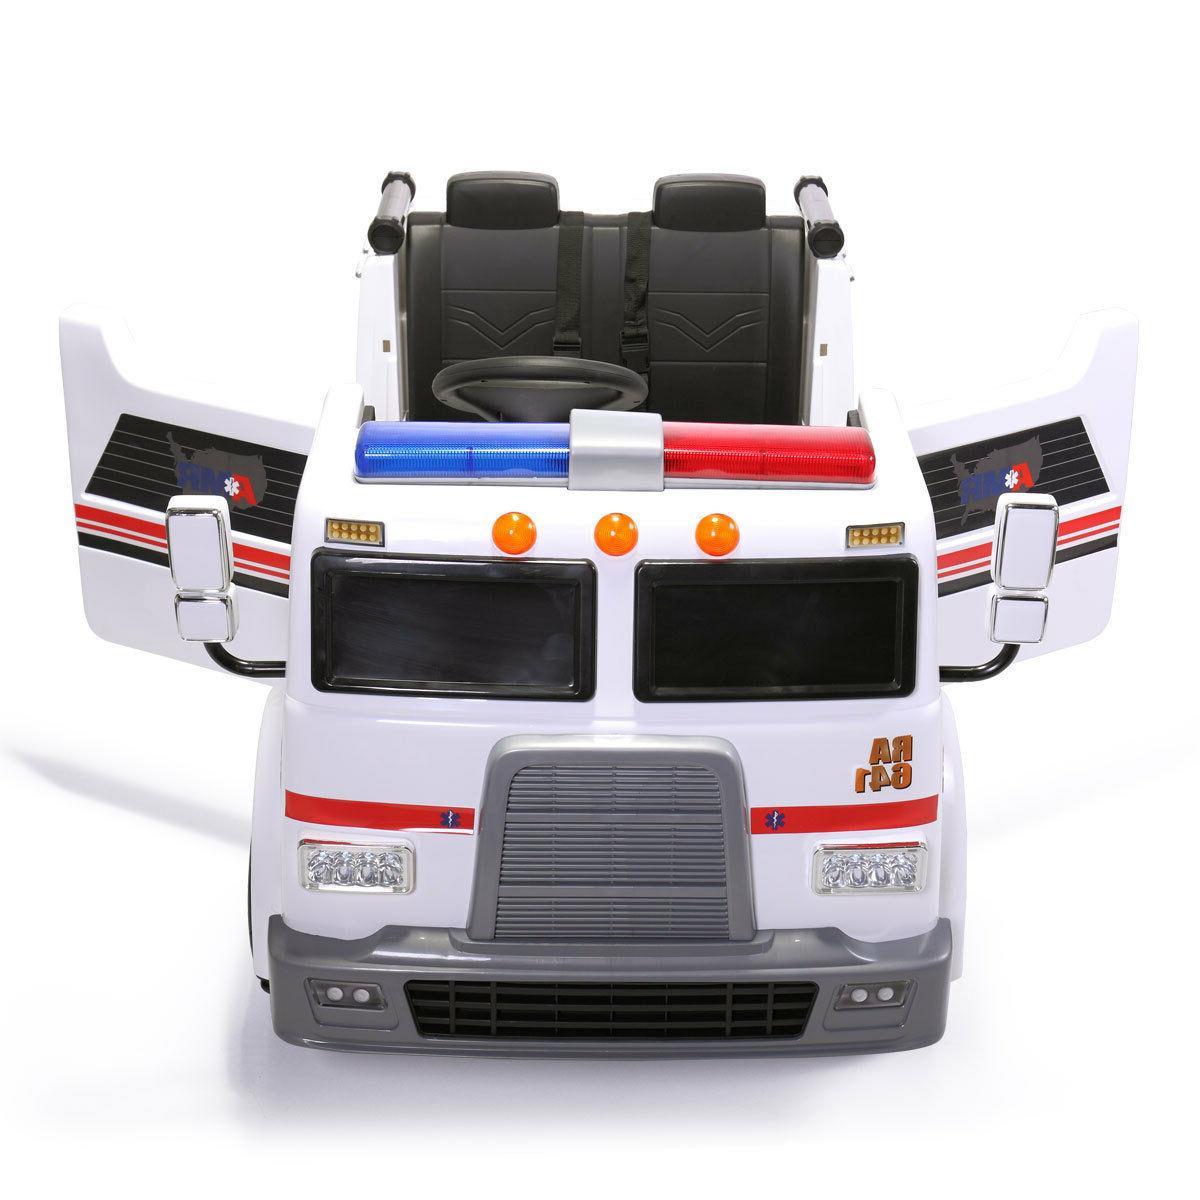 Ride Kids Ambulance Truck Electric Battery Powered Toy Vehicle